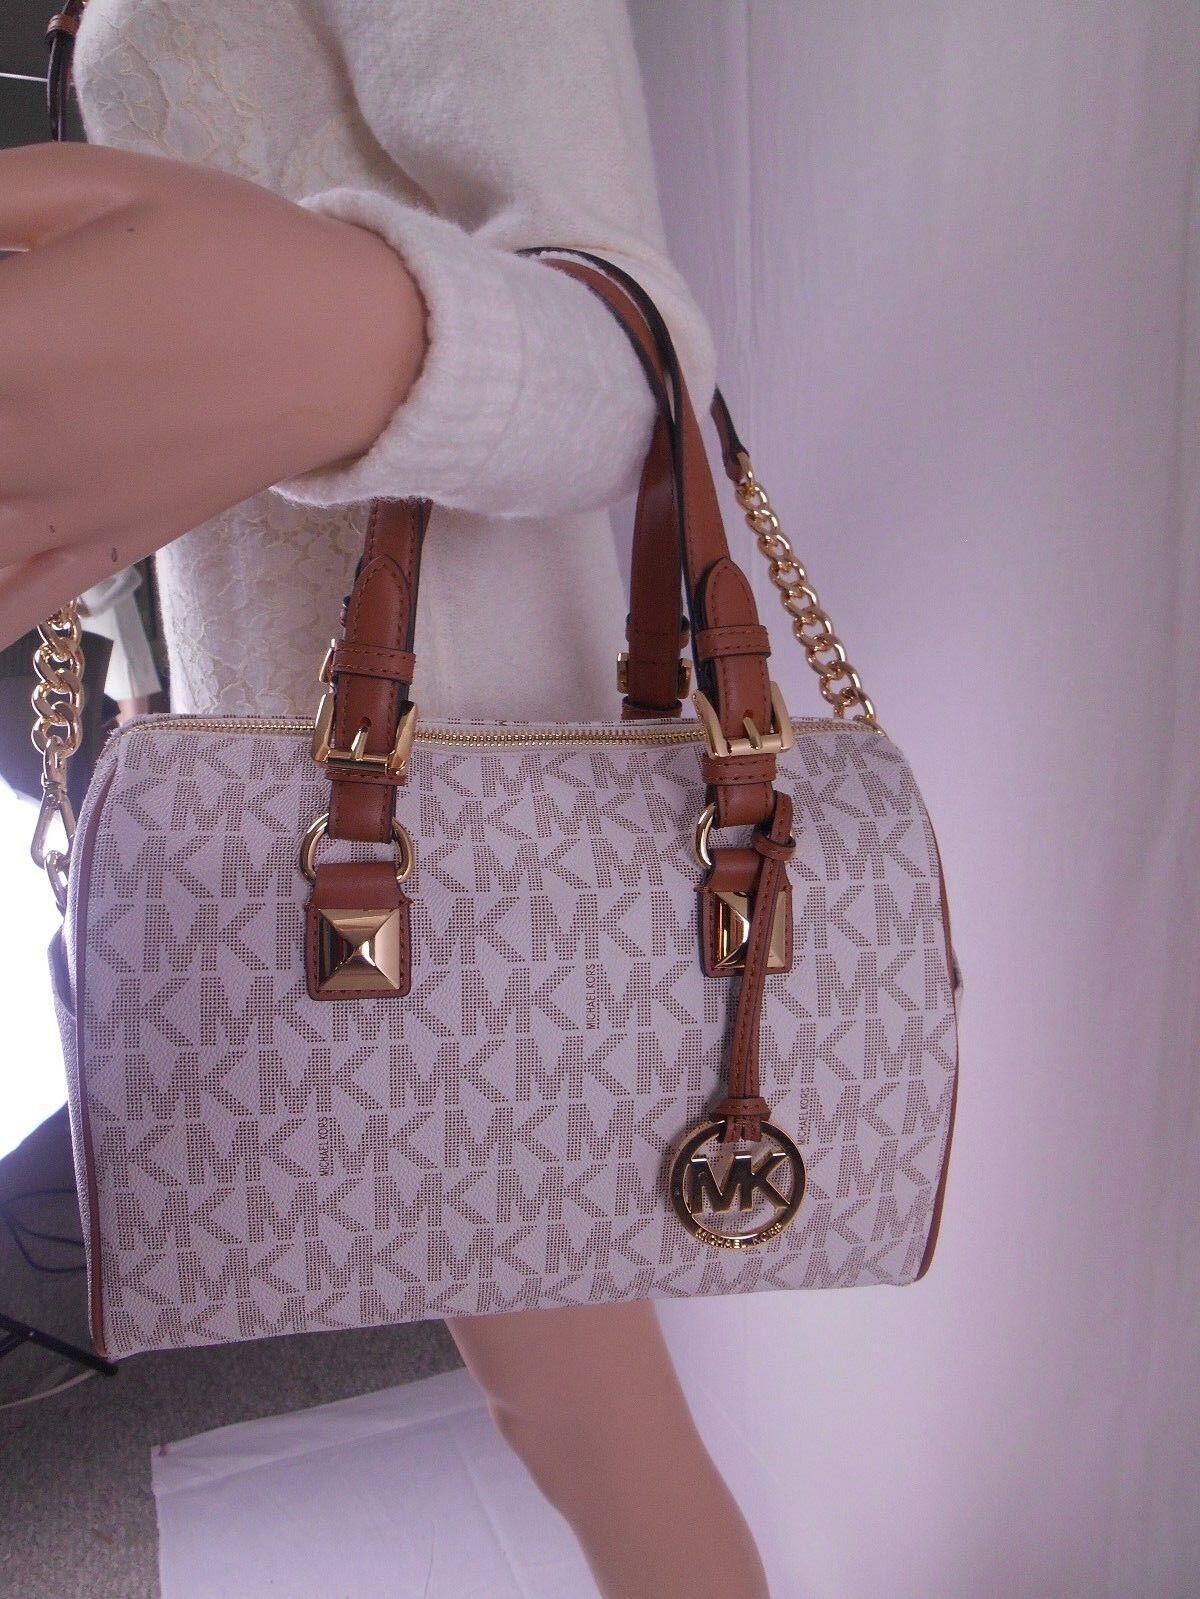 24cb378254f9d Burberry Handbags Ebay Uk